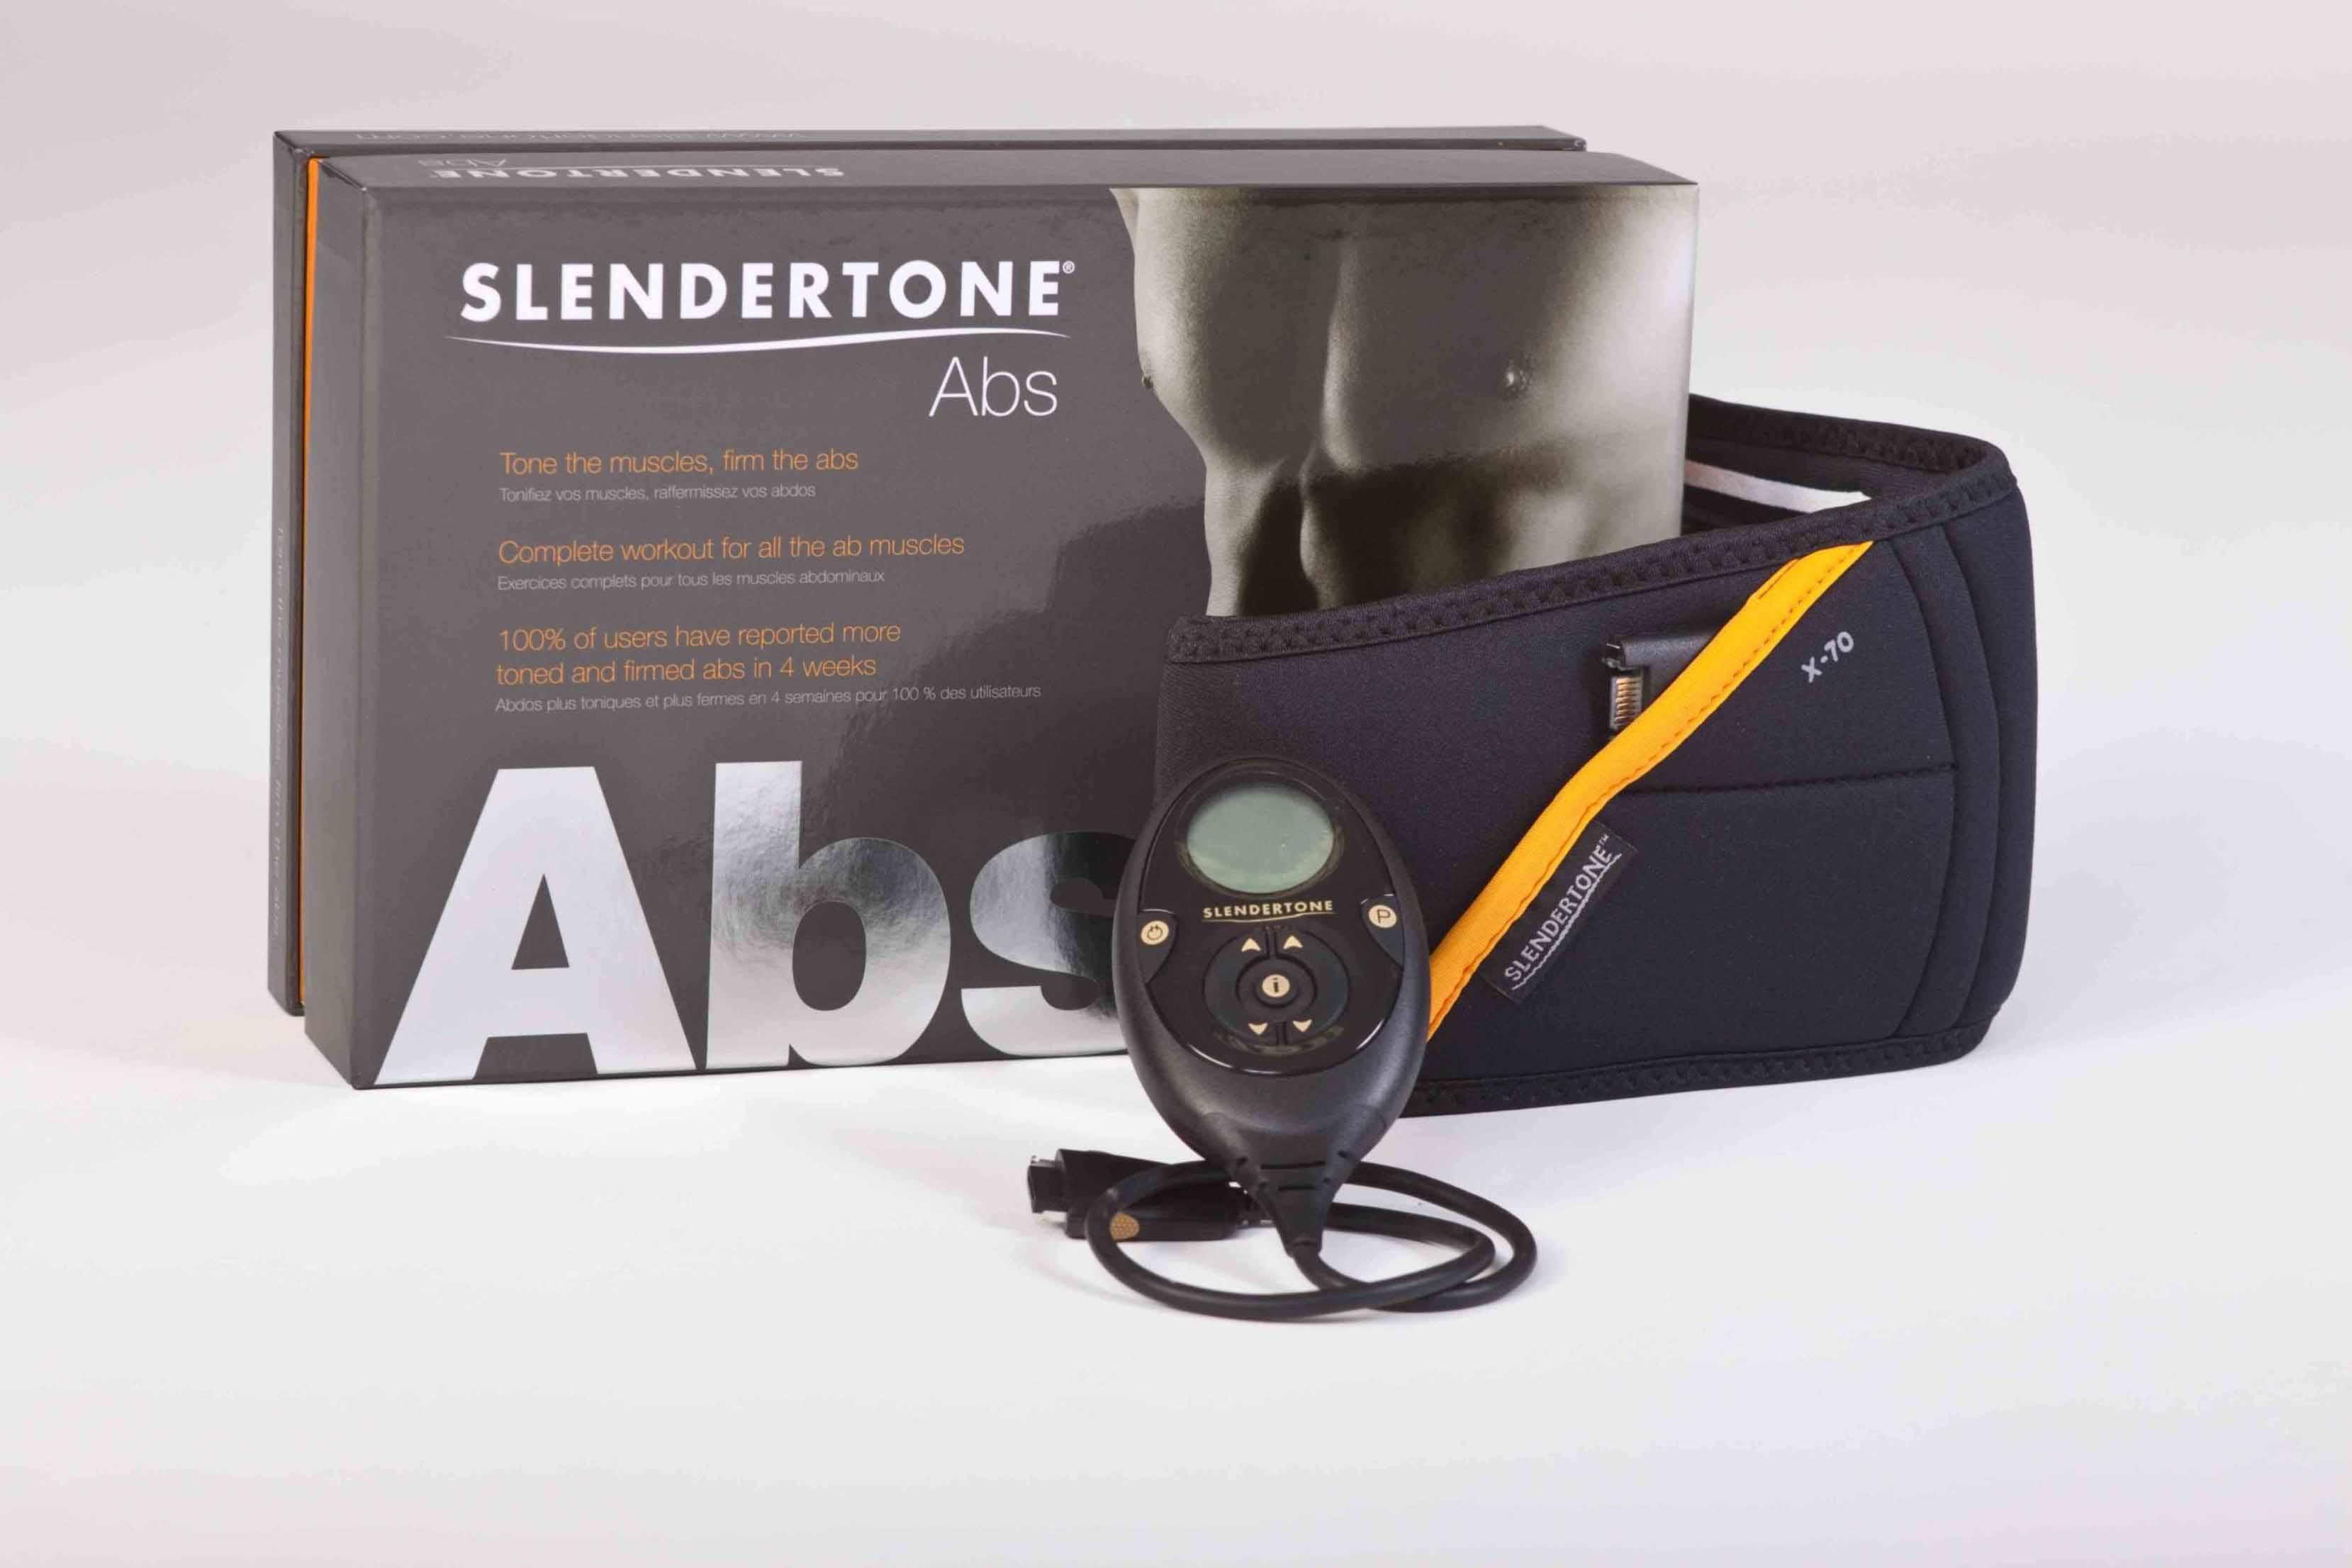 electronic muscle stimulation ems archives nazninazeez. Black Bedroom Furniture Sets. Home Design Ideas